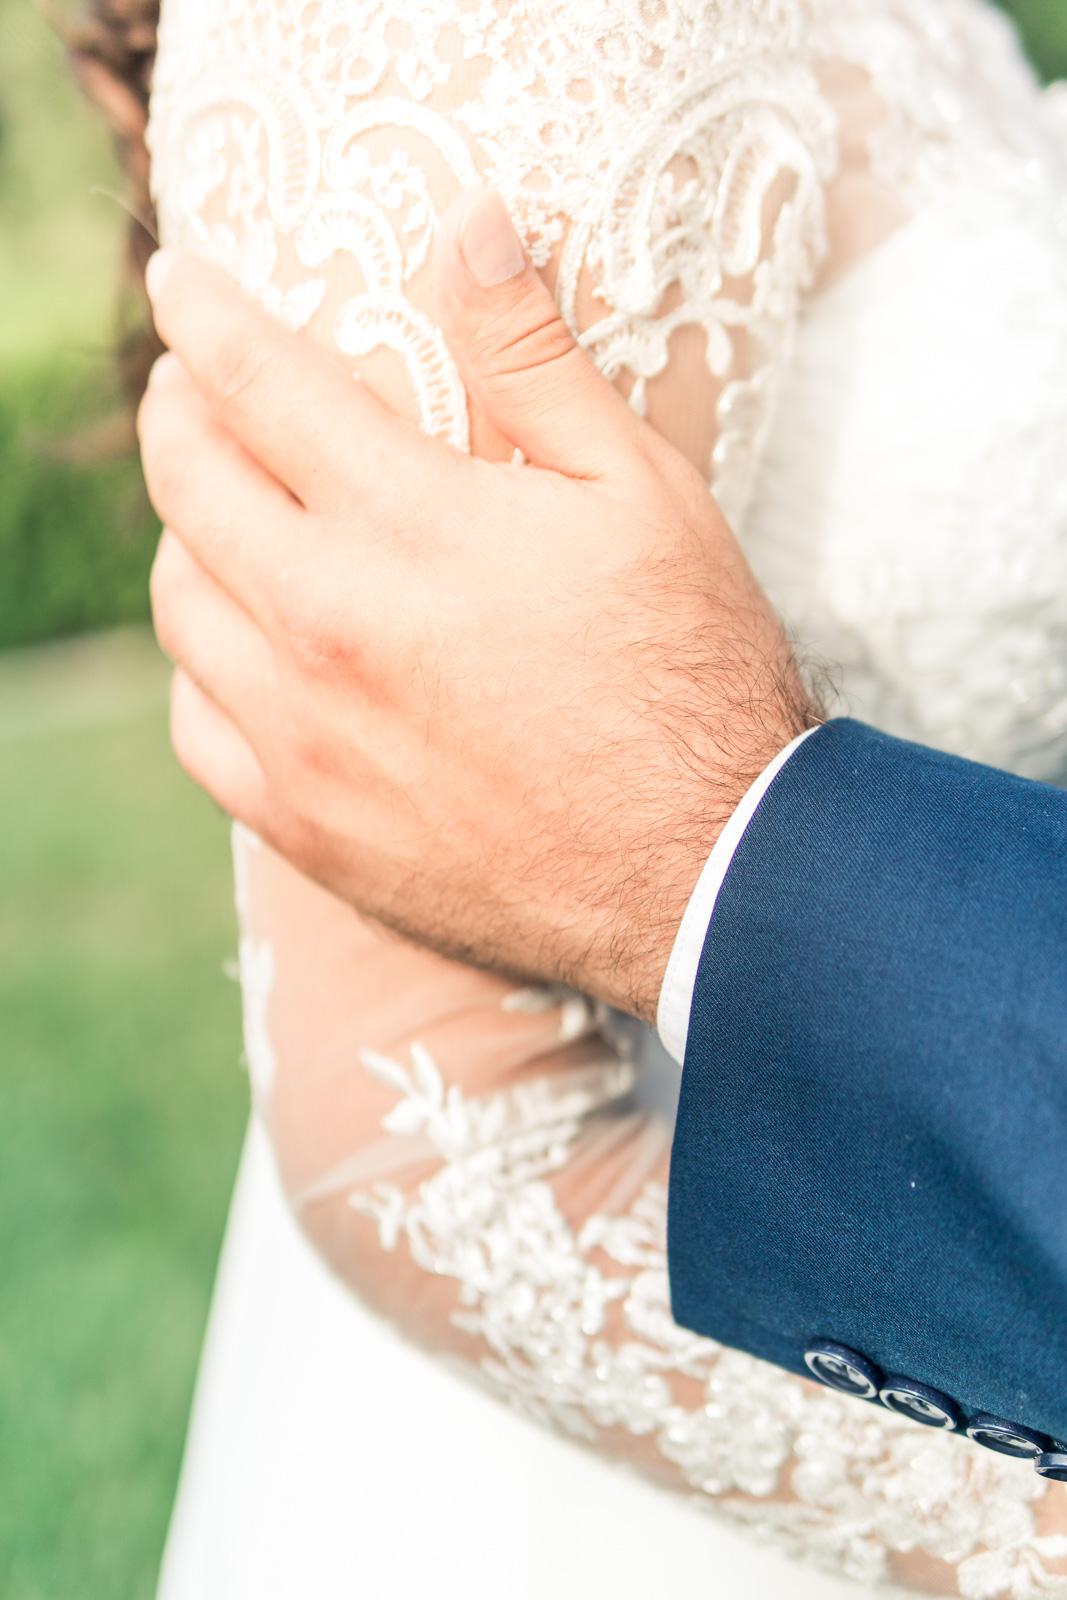 69_Angel-Brea-Orange-County_Joseph-Barber-Wedding-Photography.jpg